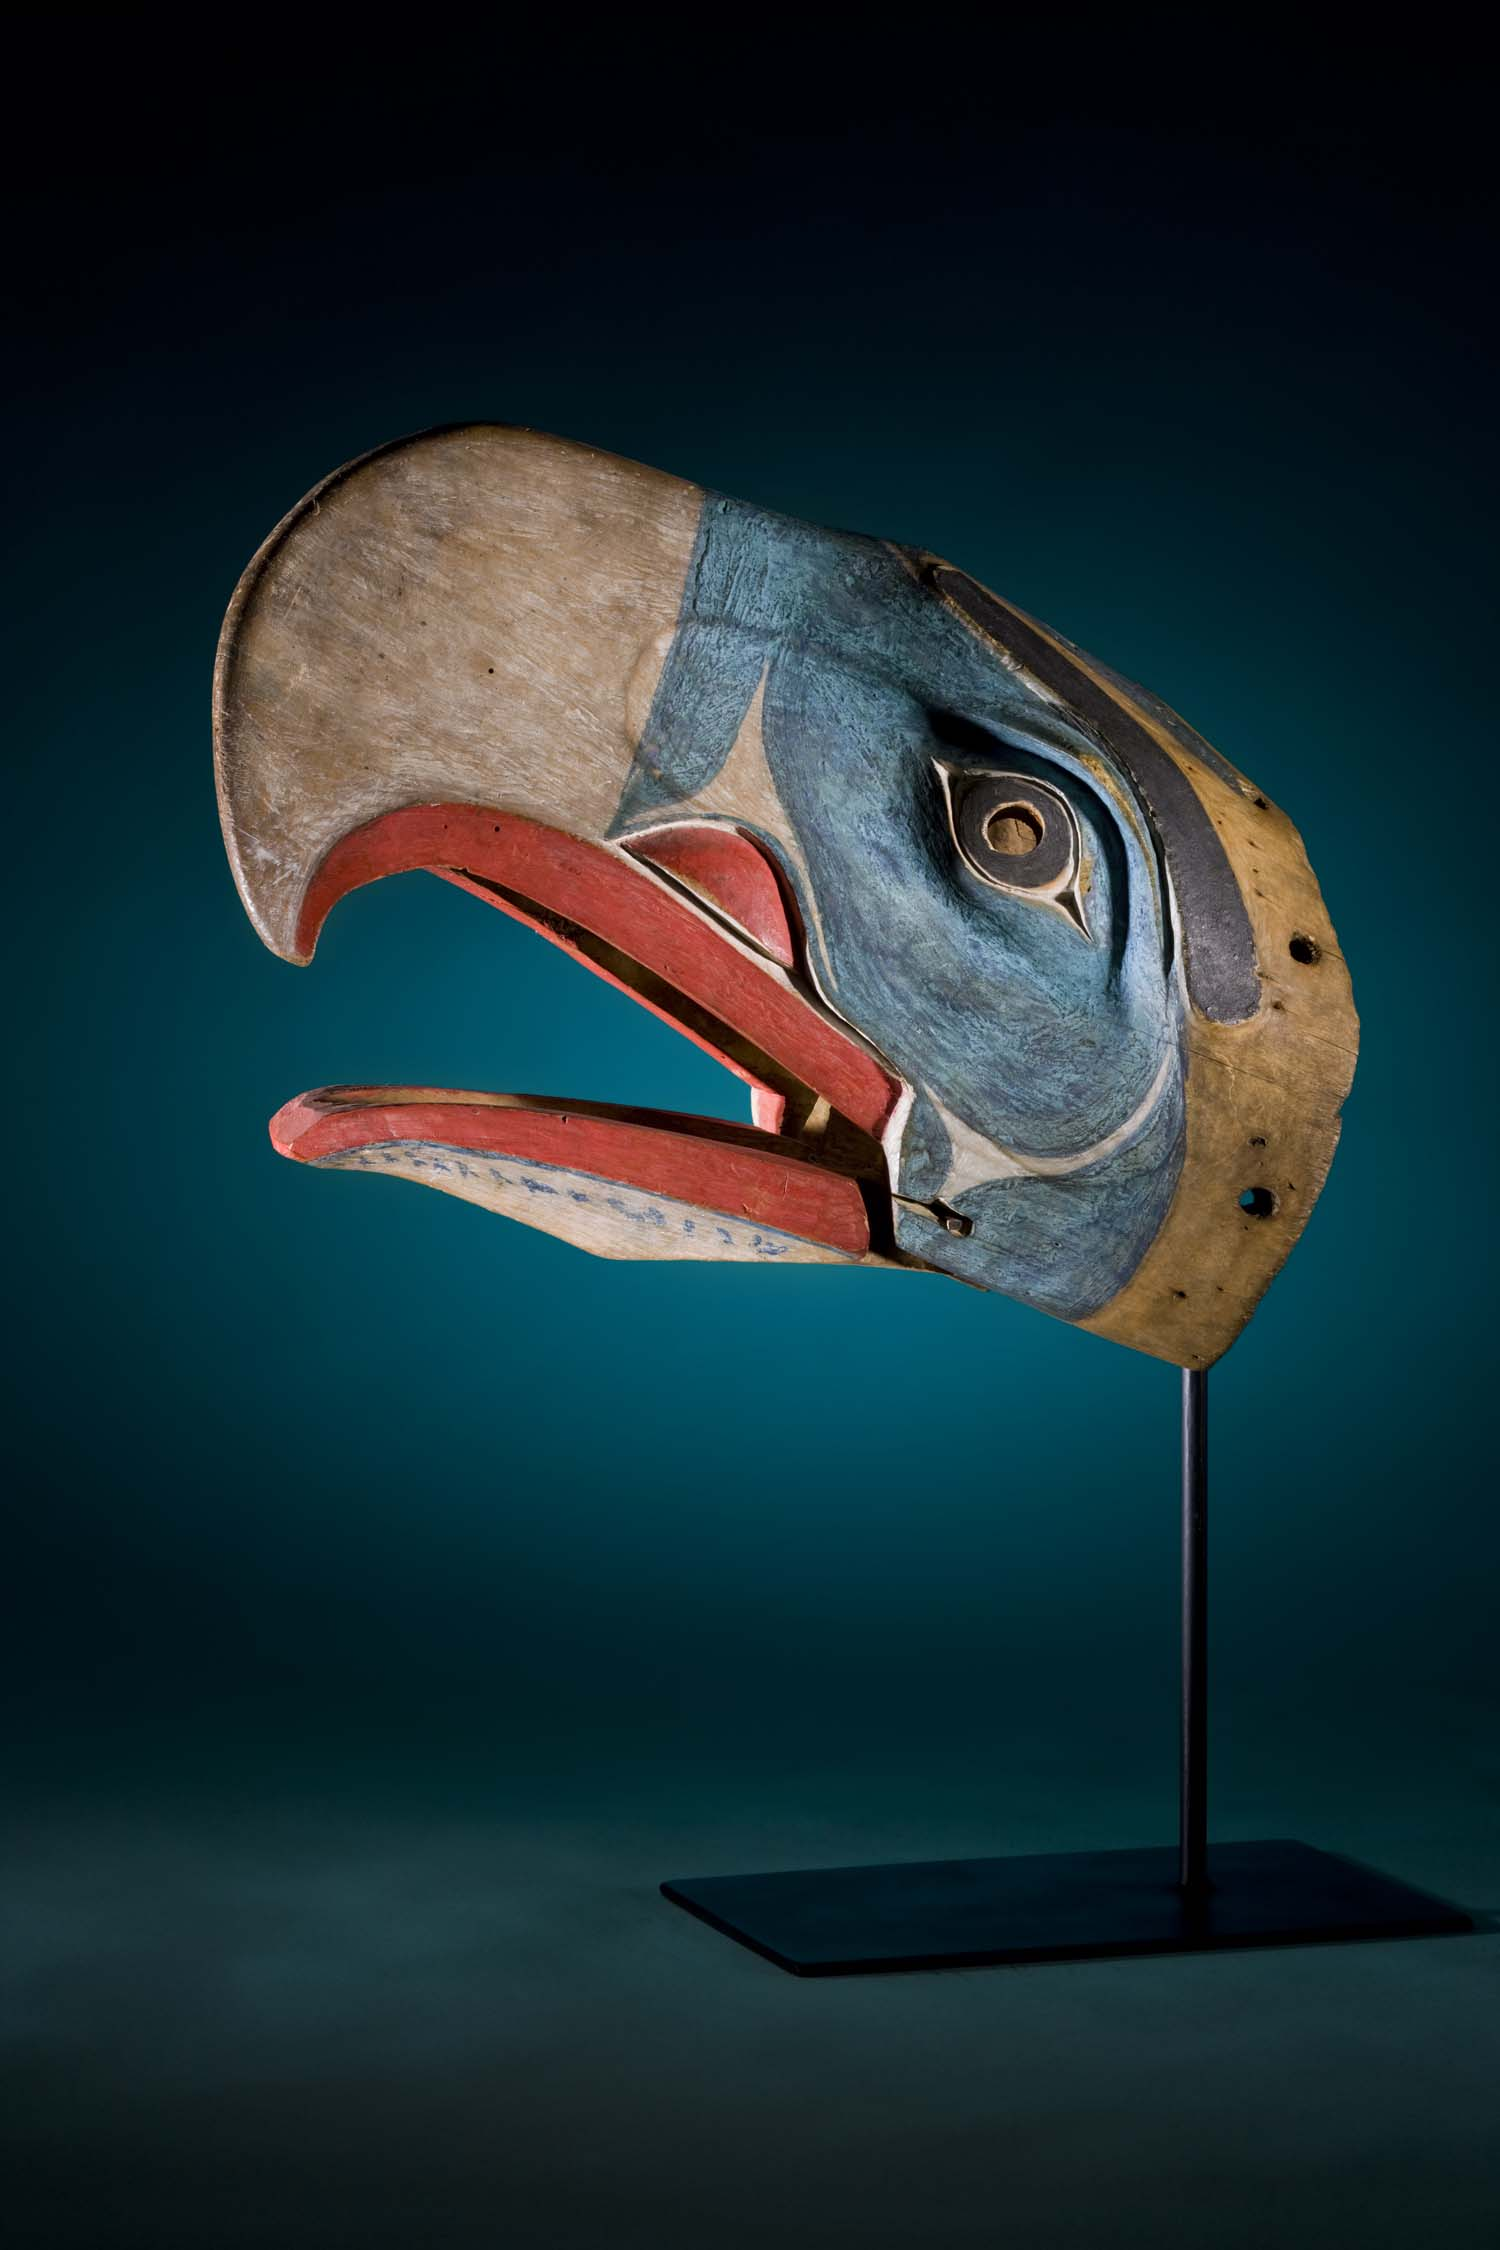 Bella Coola Eagle Mask